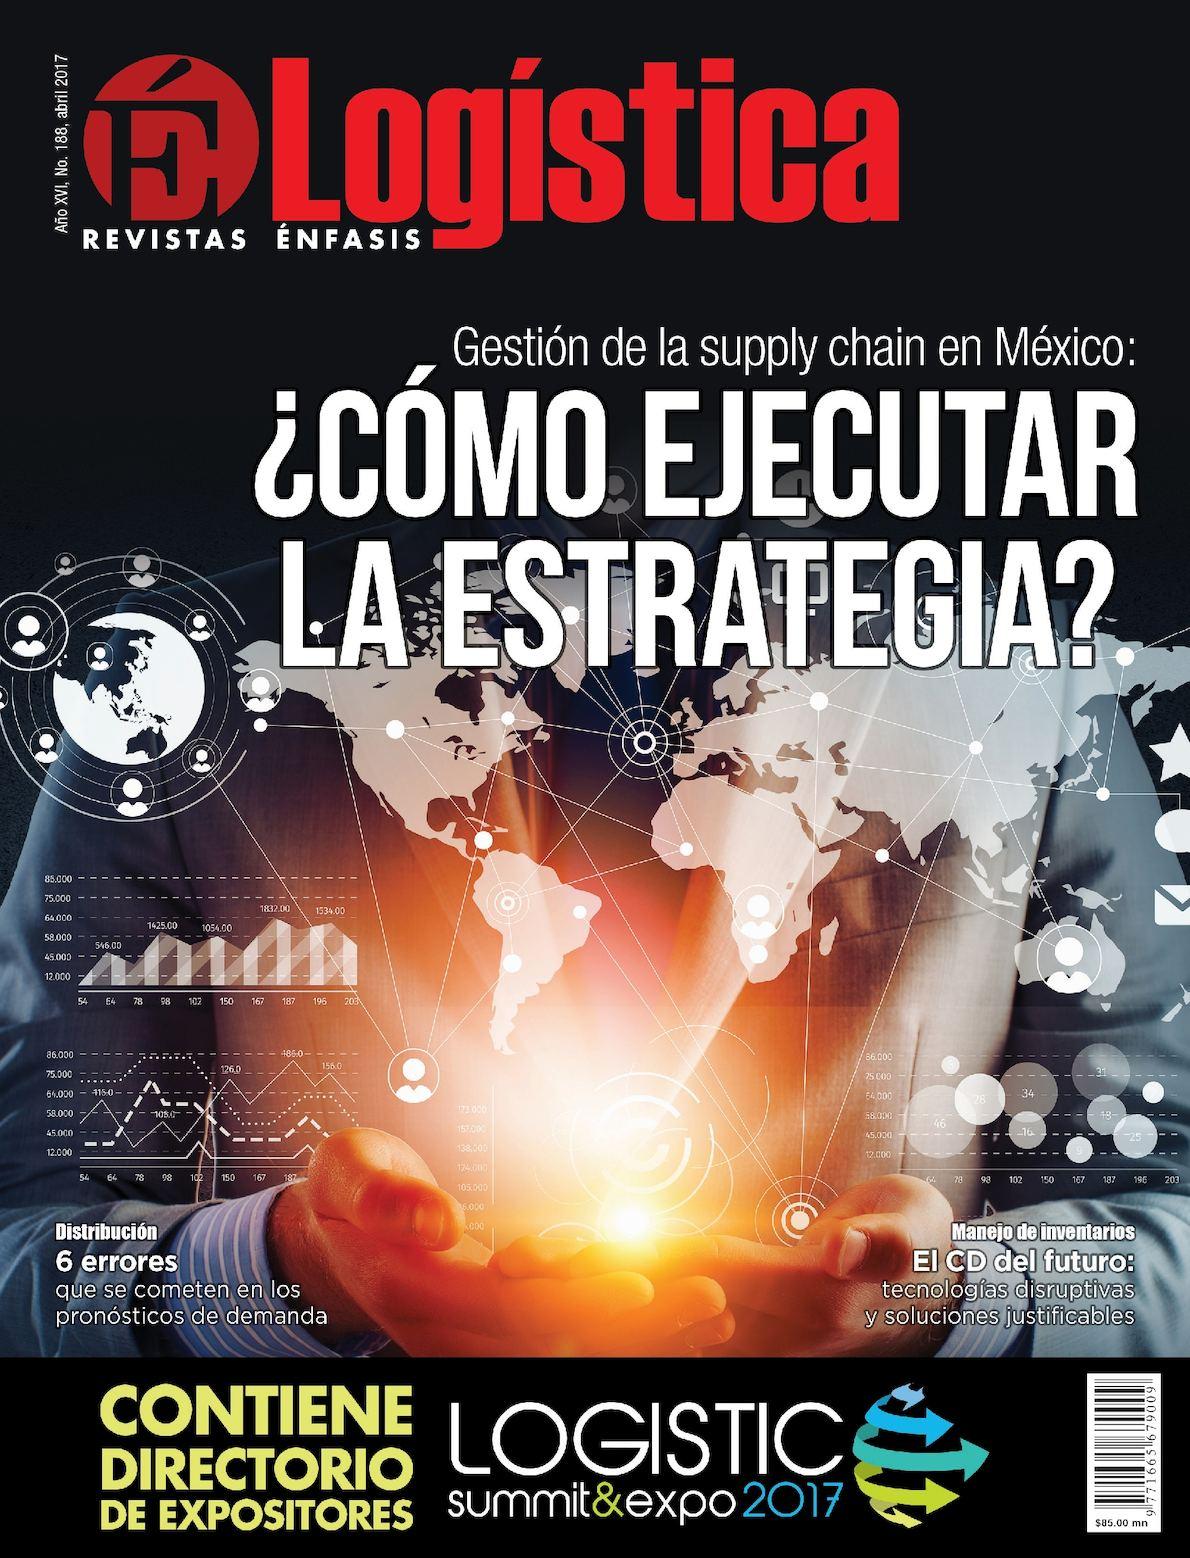 ÉNFASIS LOGÍSTICA NO.188 ABRIL/2017